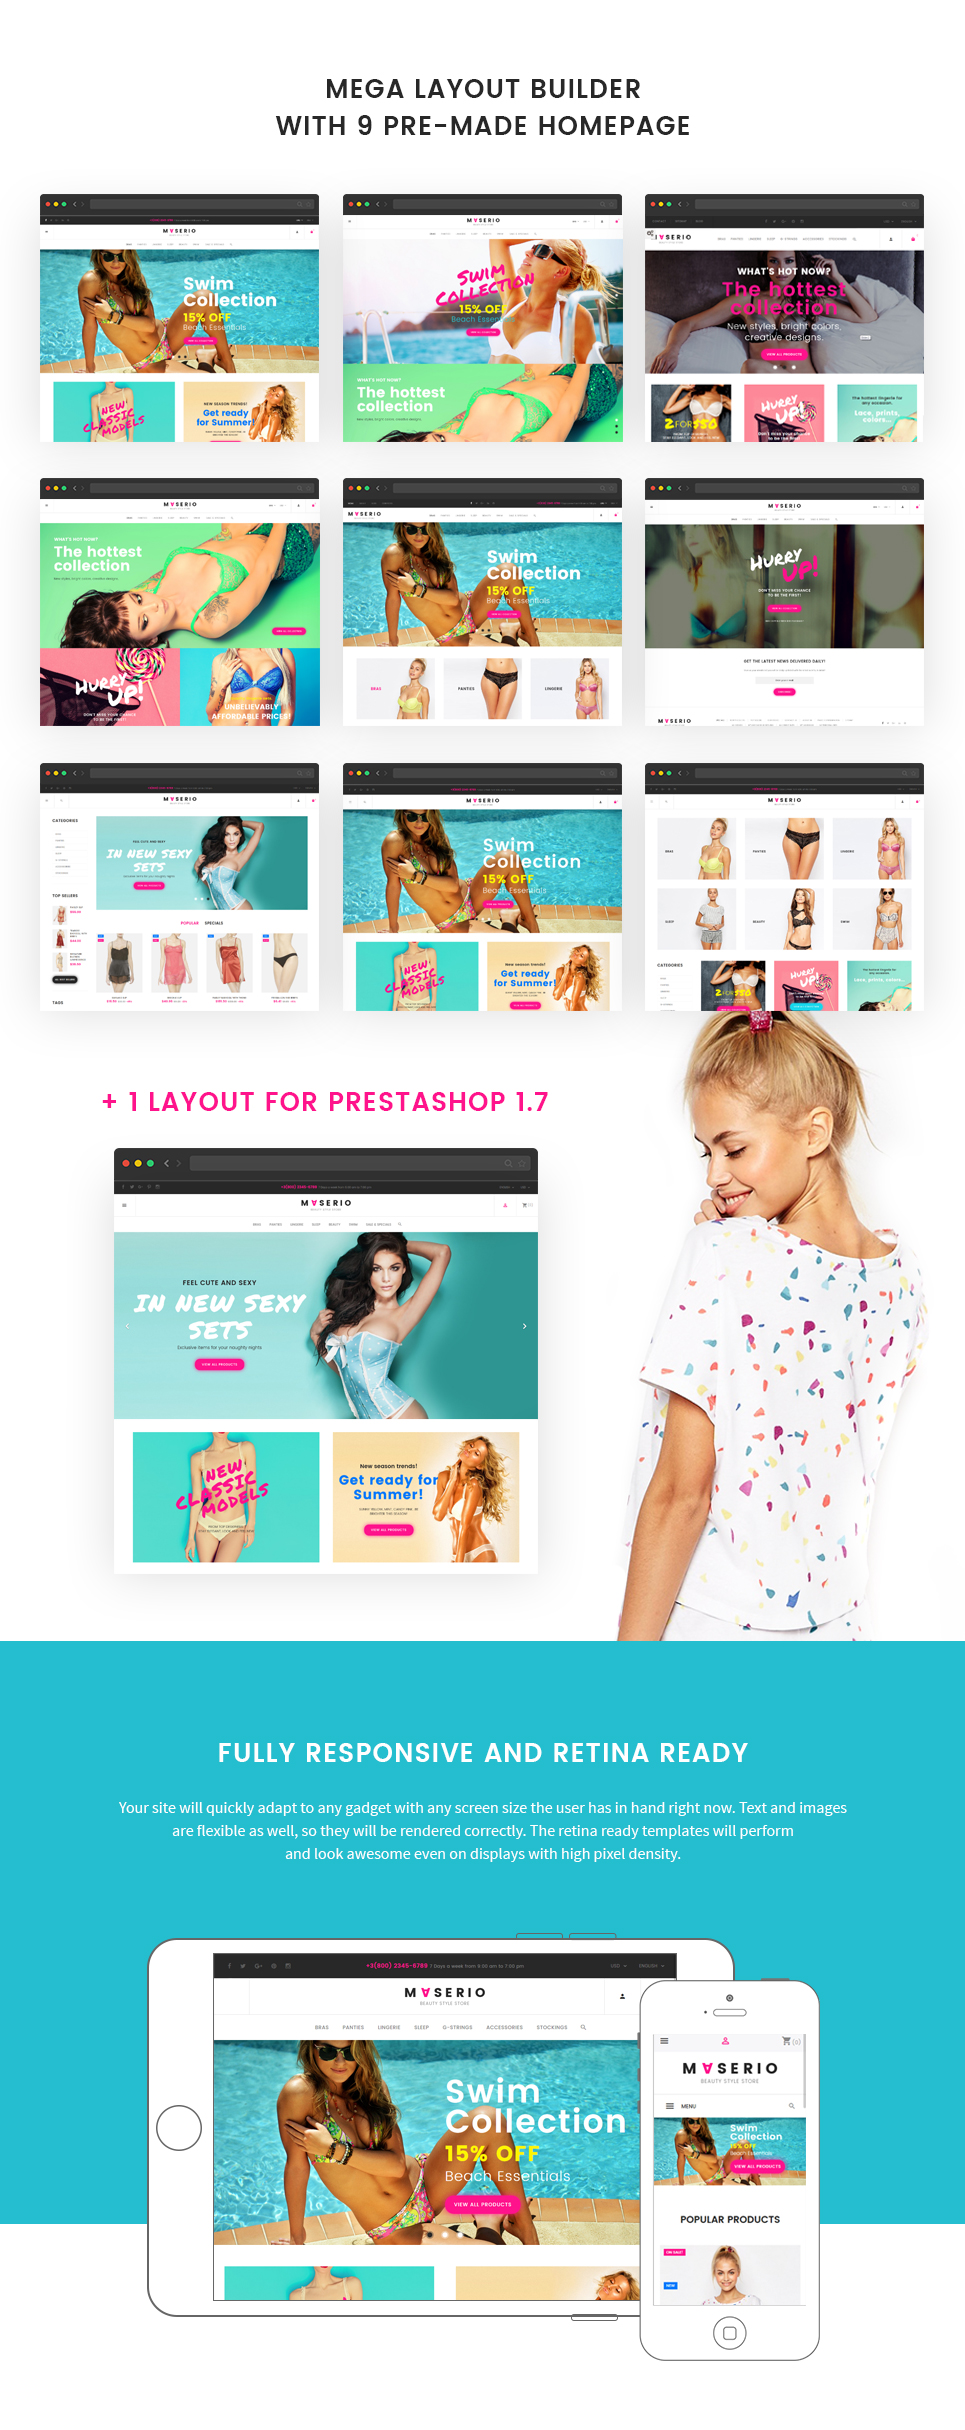 Maserio - Lingerie PrestaShop 1.7 and 1.6 Theme - 2